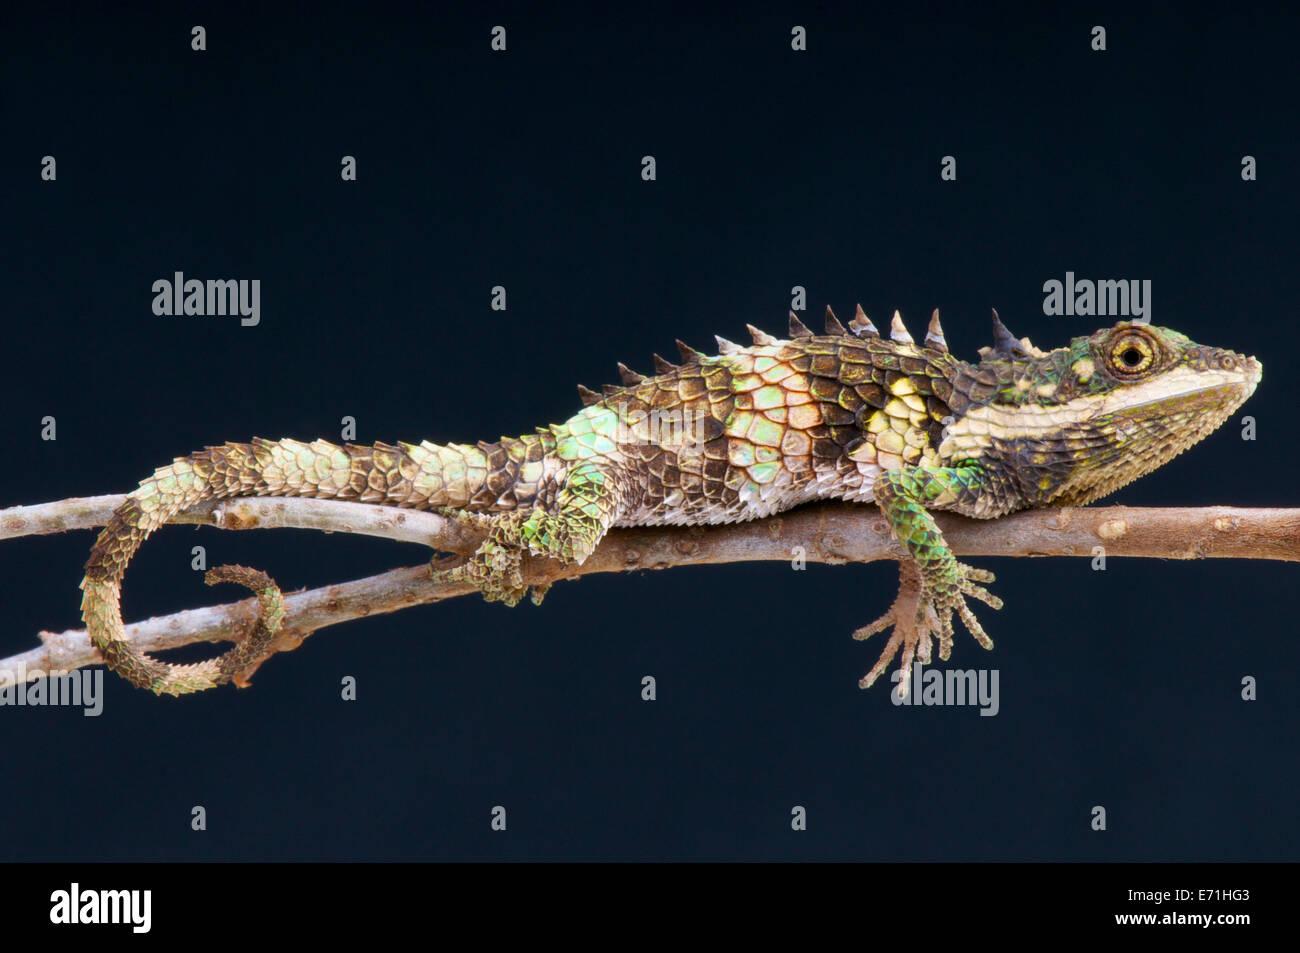 Pygmy lizard / Cophotis ceylanica, Sri Lanka - Stock Image